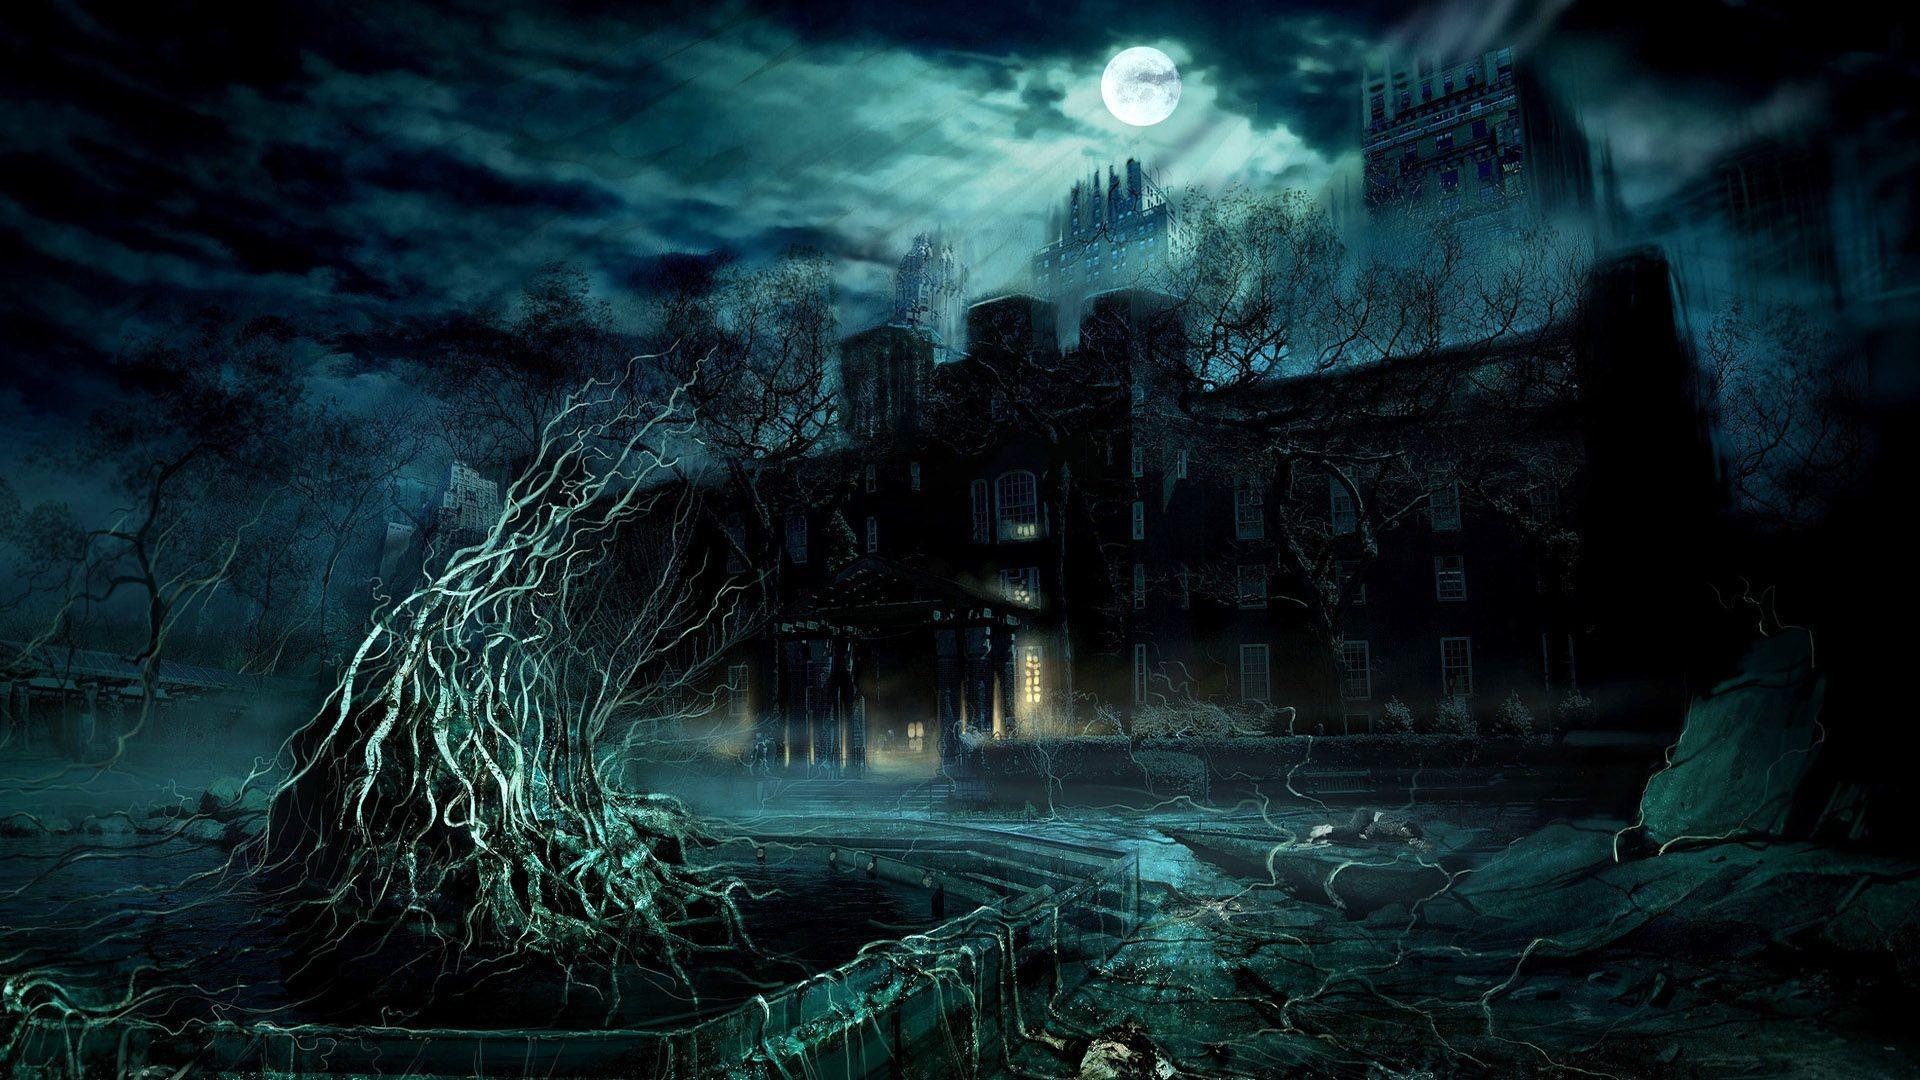 Gothic / Dark Art: 3D Fantasy Places HD, picture nr. 47797